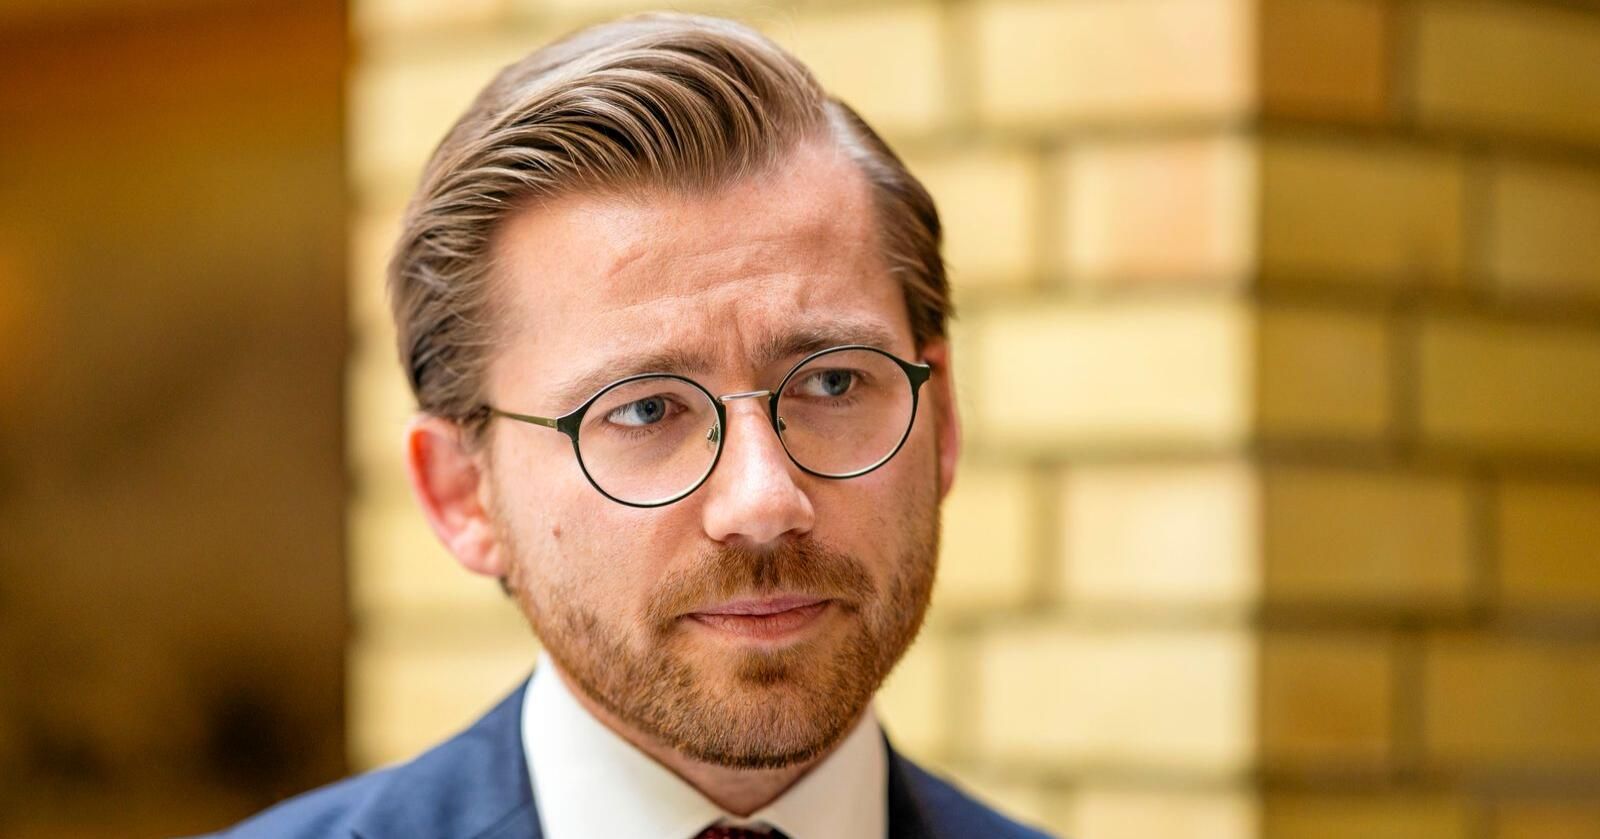 Får kritikk: Klima- og miljøminister Sveinung Rotevatn (V). Foto: Håkon Mosvold Larsen / NTB scanpix